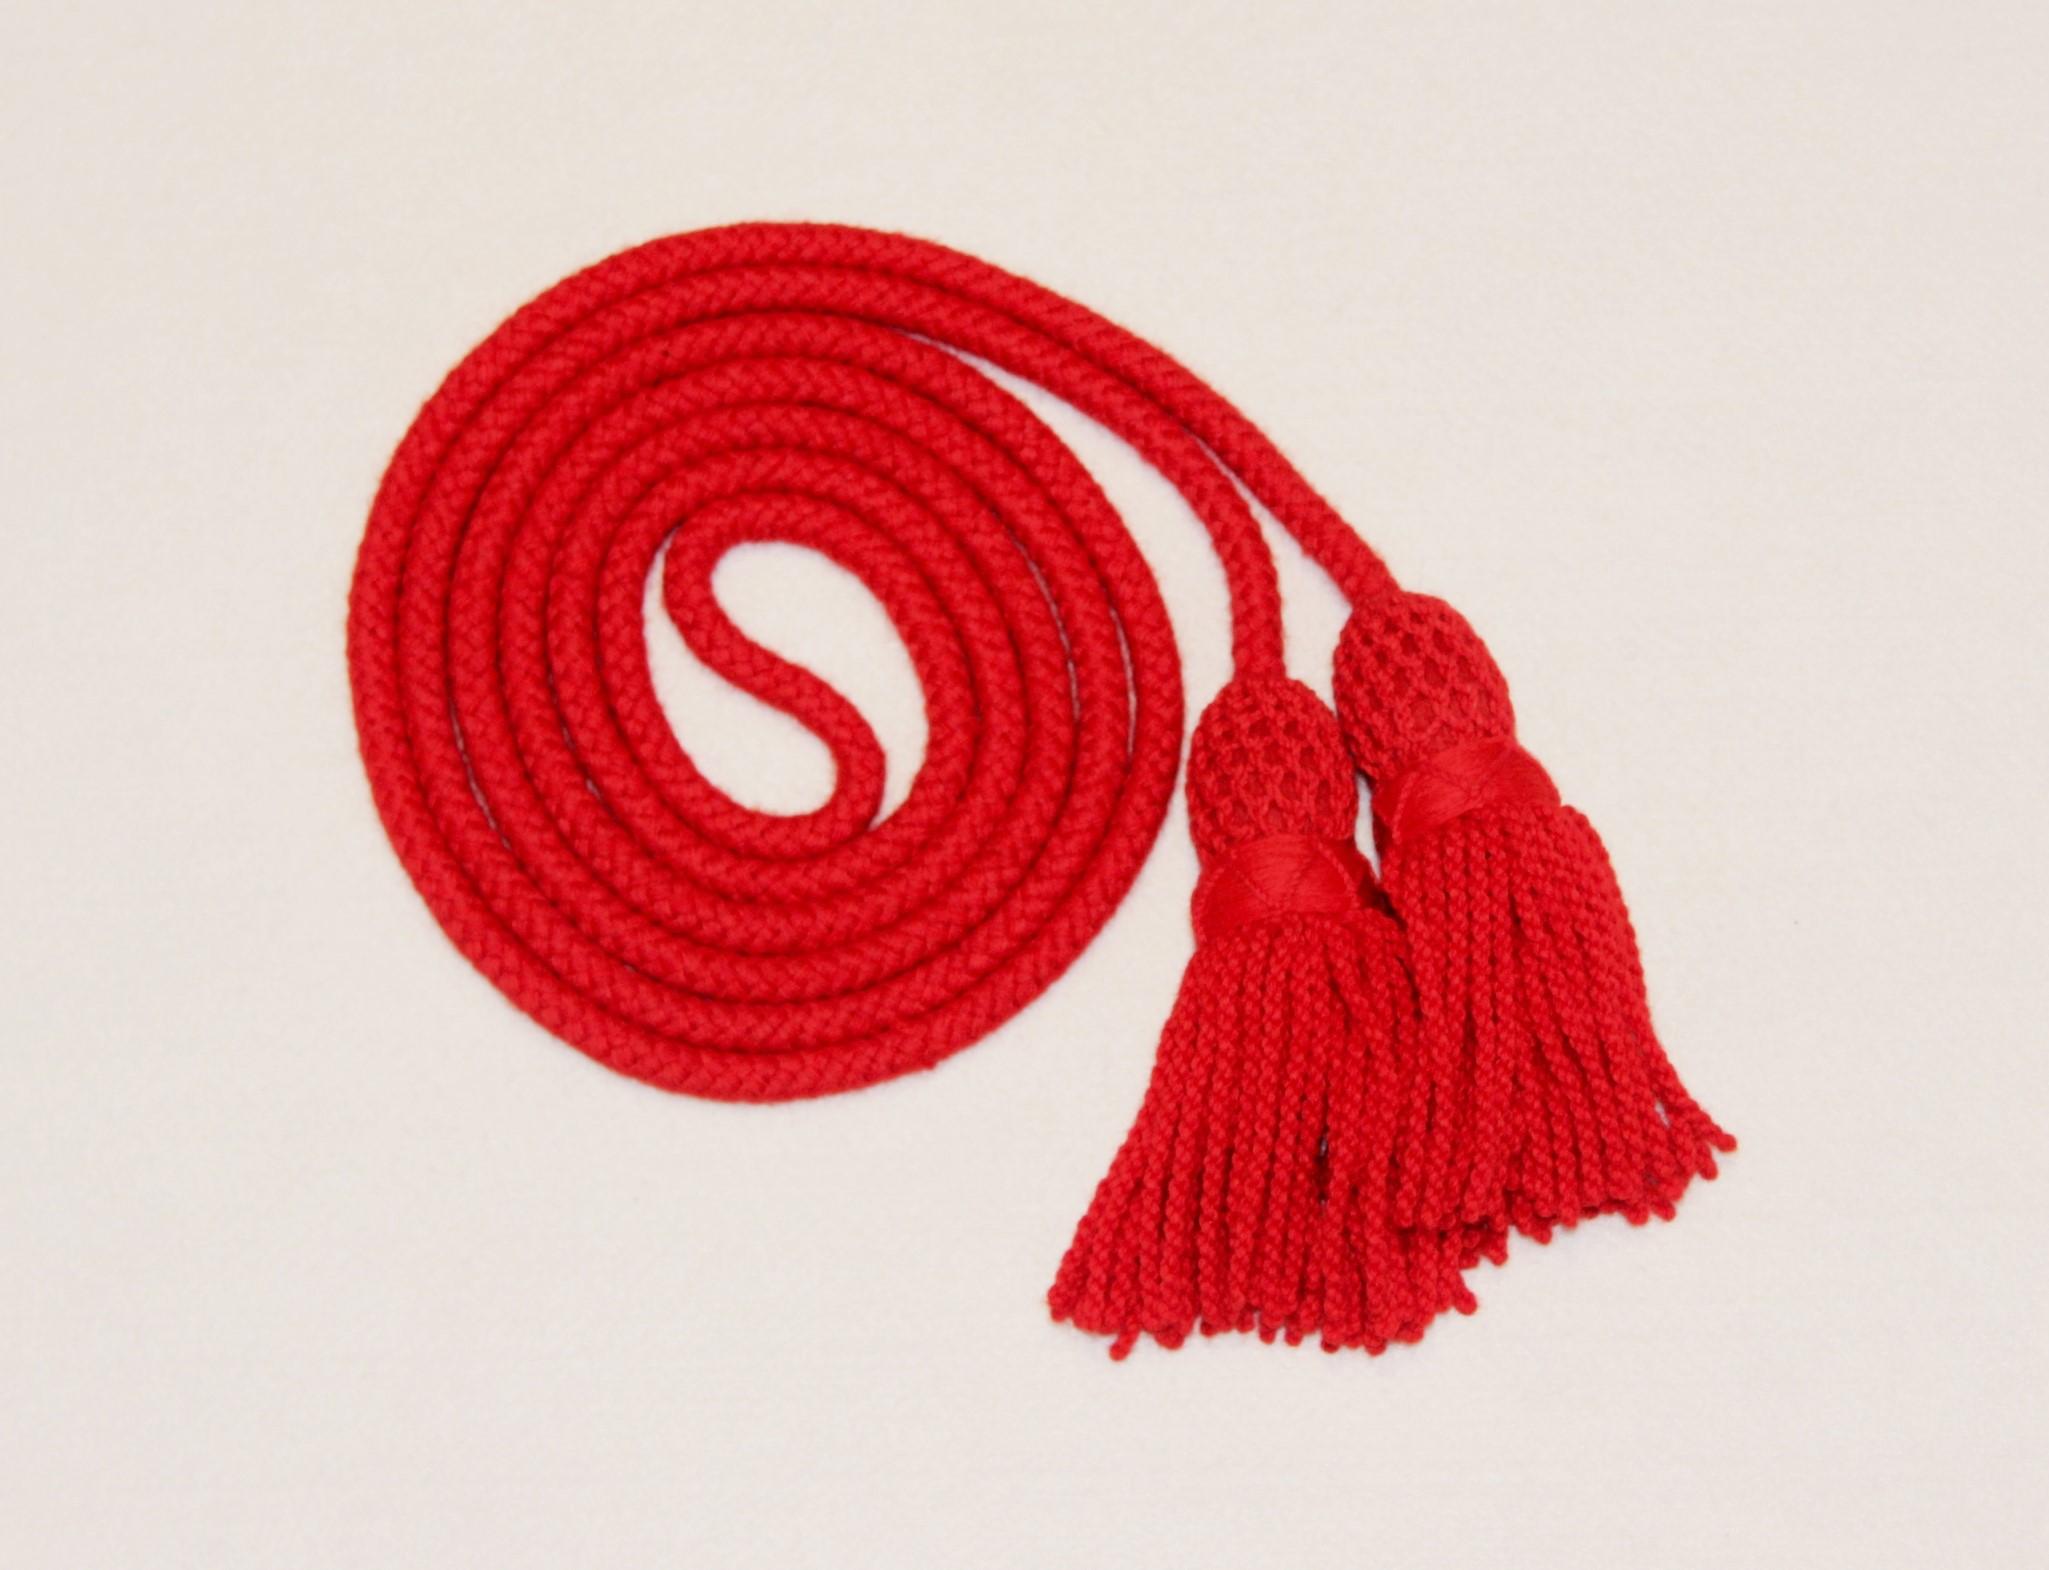 BRASS BUGLE WOOL MULTI  COLOR RED BLACK /& PURPLE//SILVER BUGLE CORD WOOL